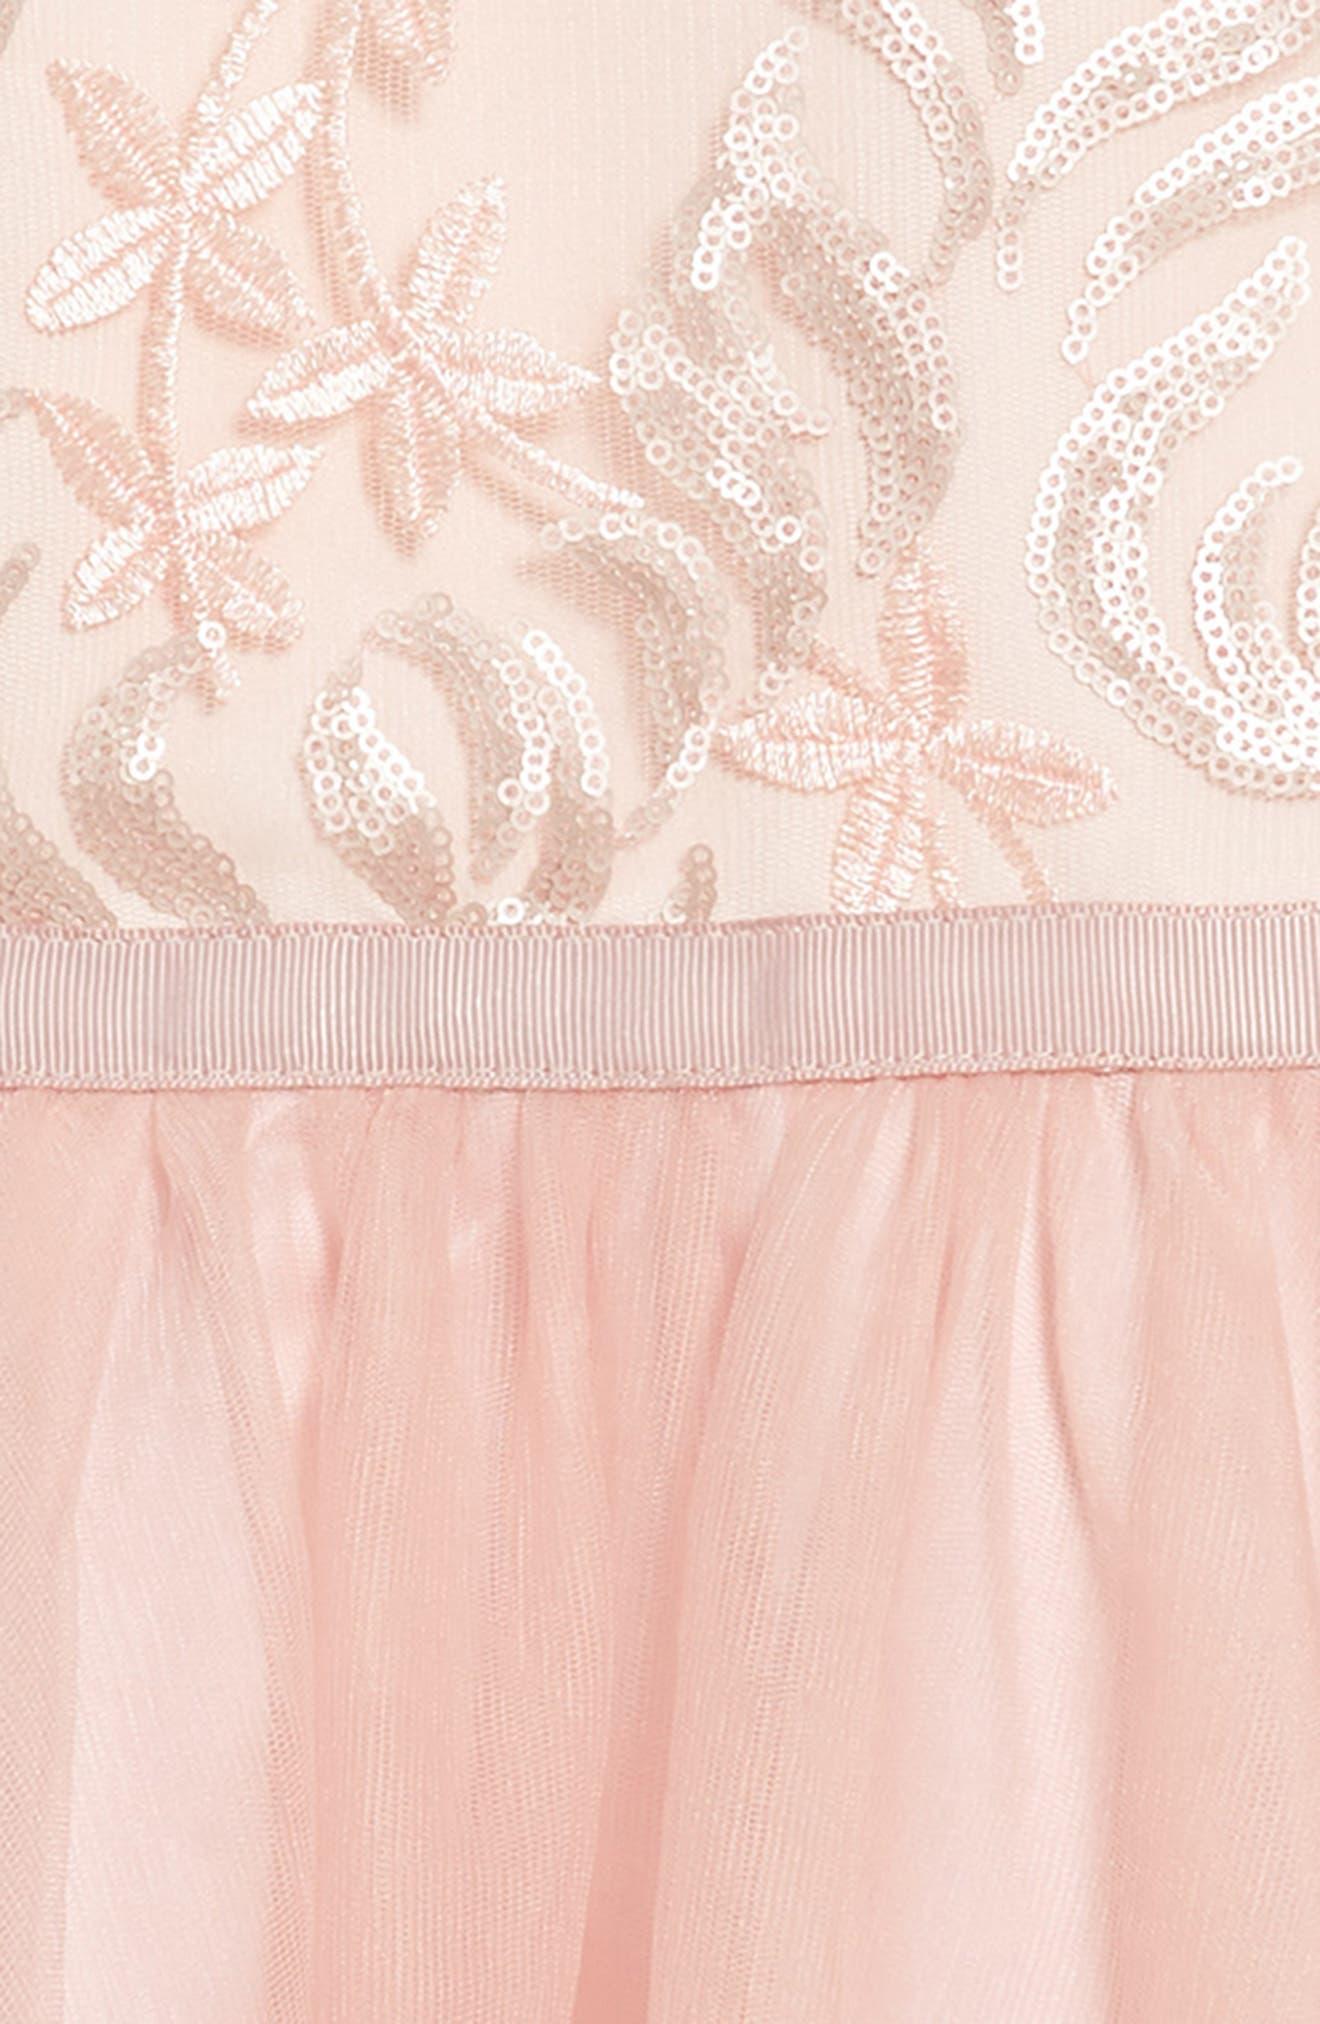 Sequin Tutu Dress,                             Alternate thumbnail 3, color,                             685